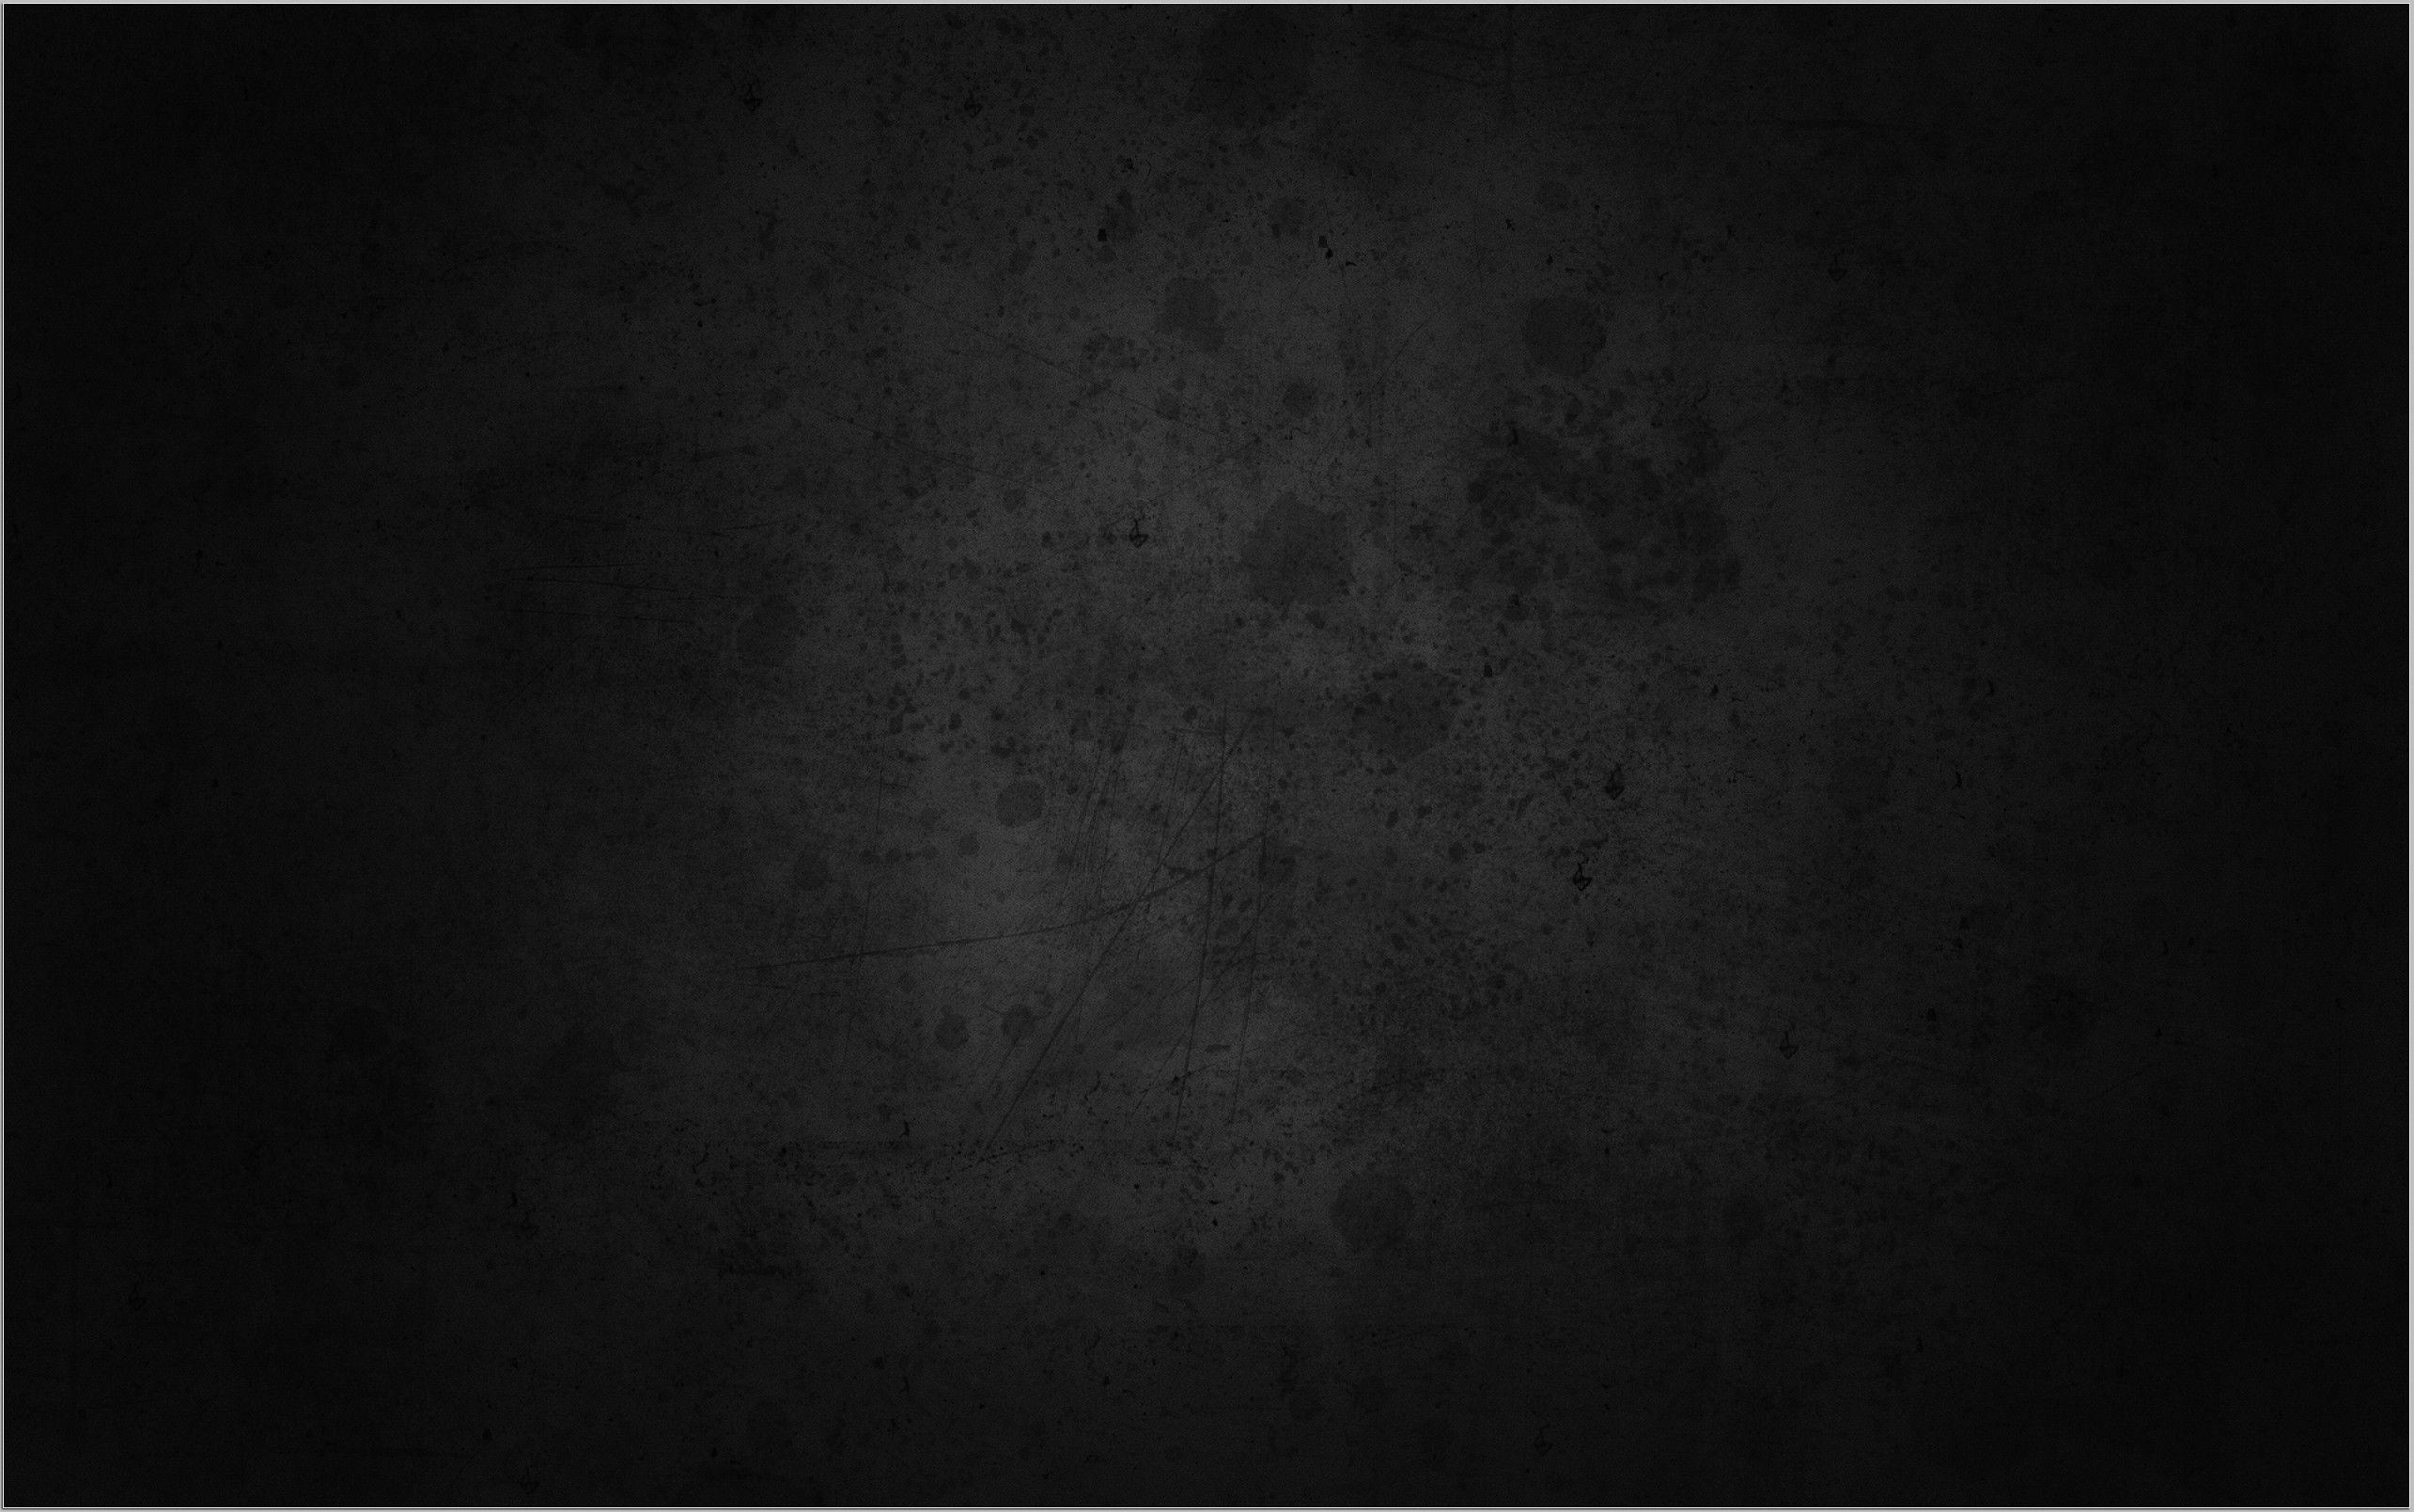 Black Wallpaper 4k Warna Hitam Gambar